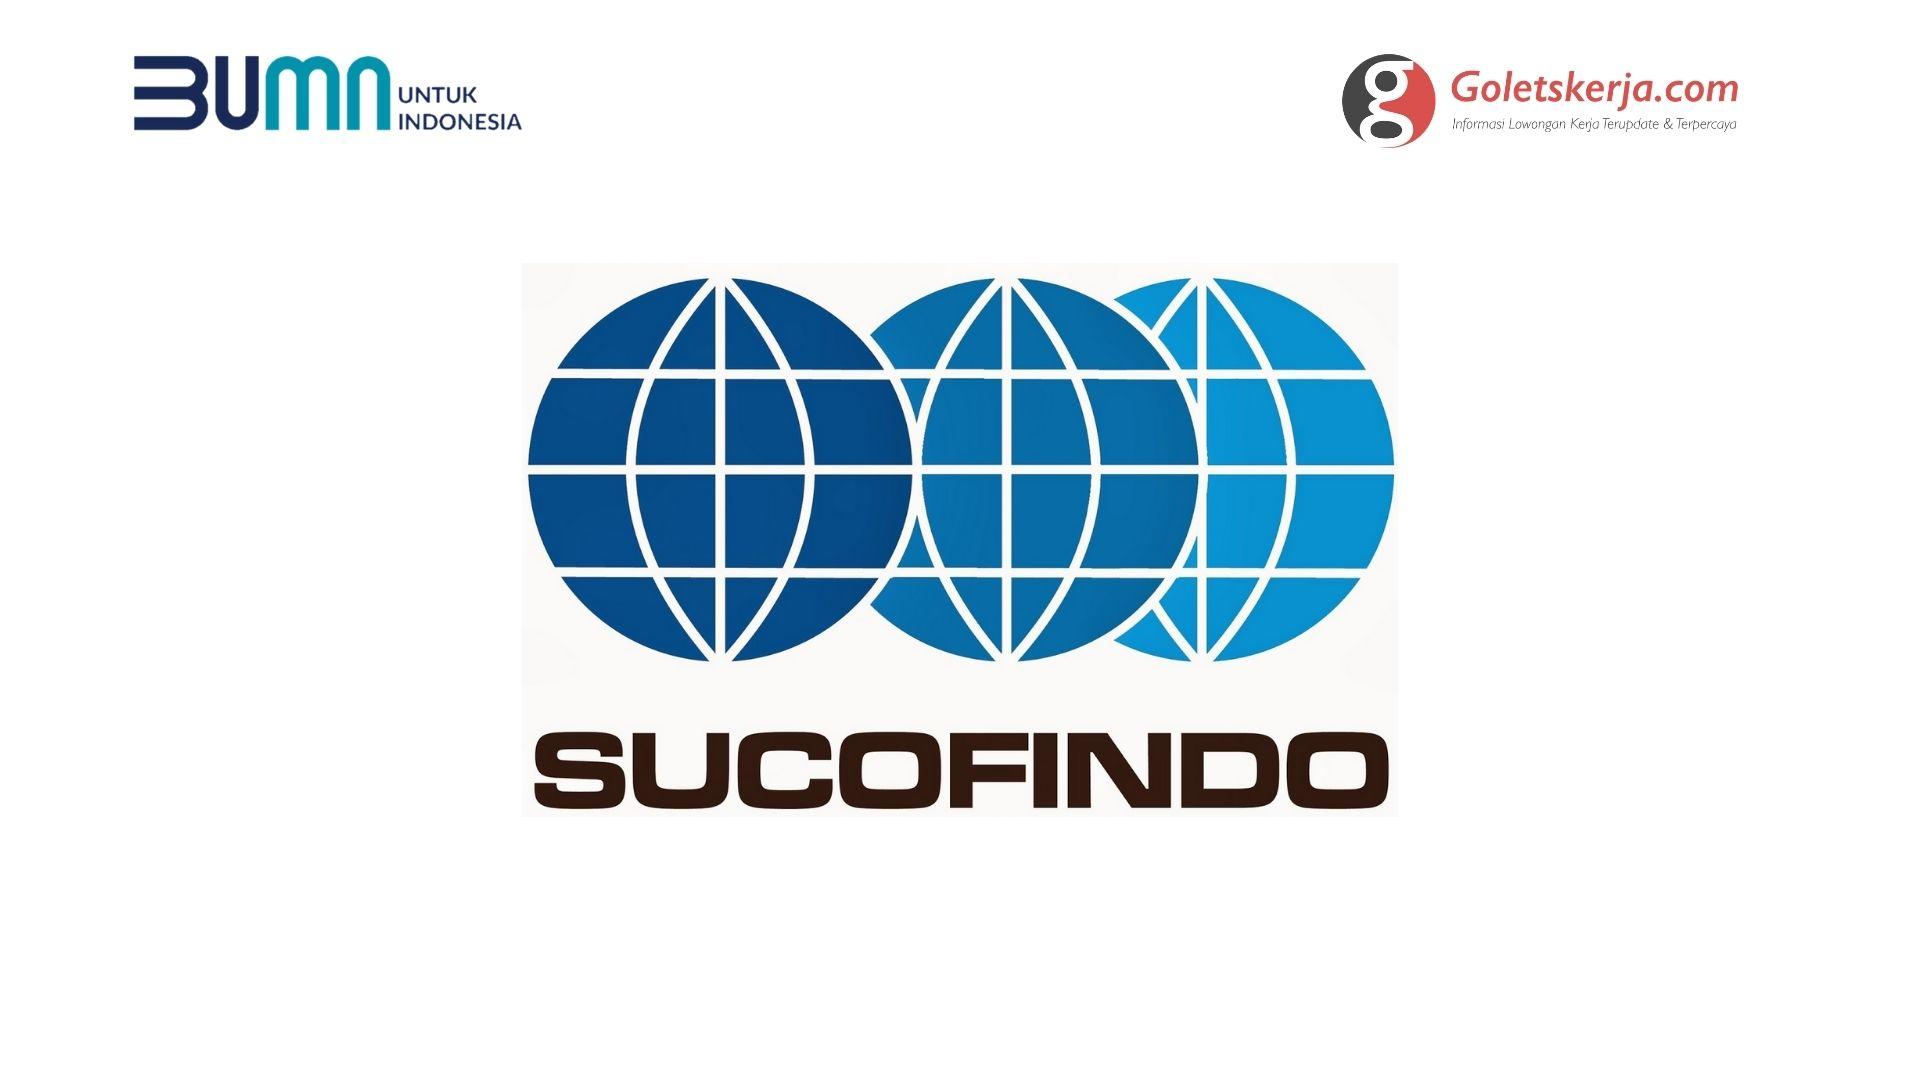 Lowongan Kerja PT Sucofindo (Persero) - April 2021